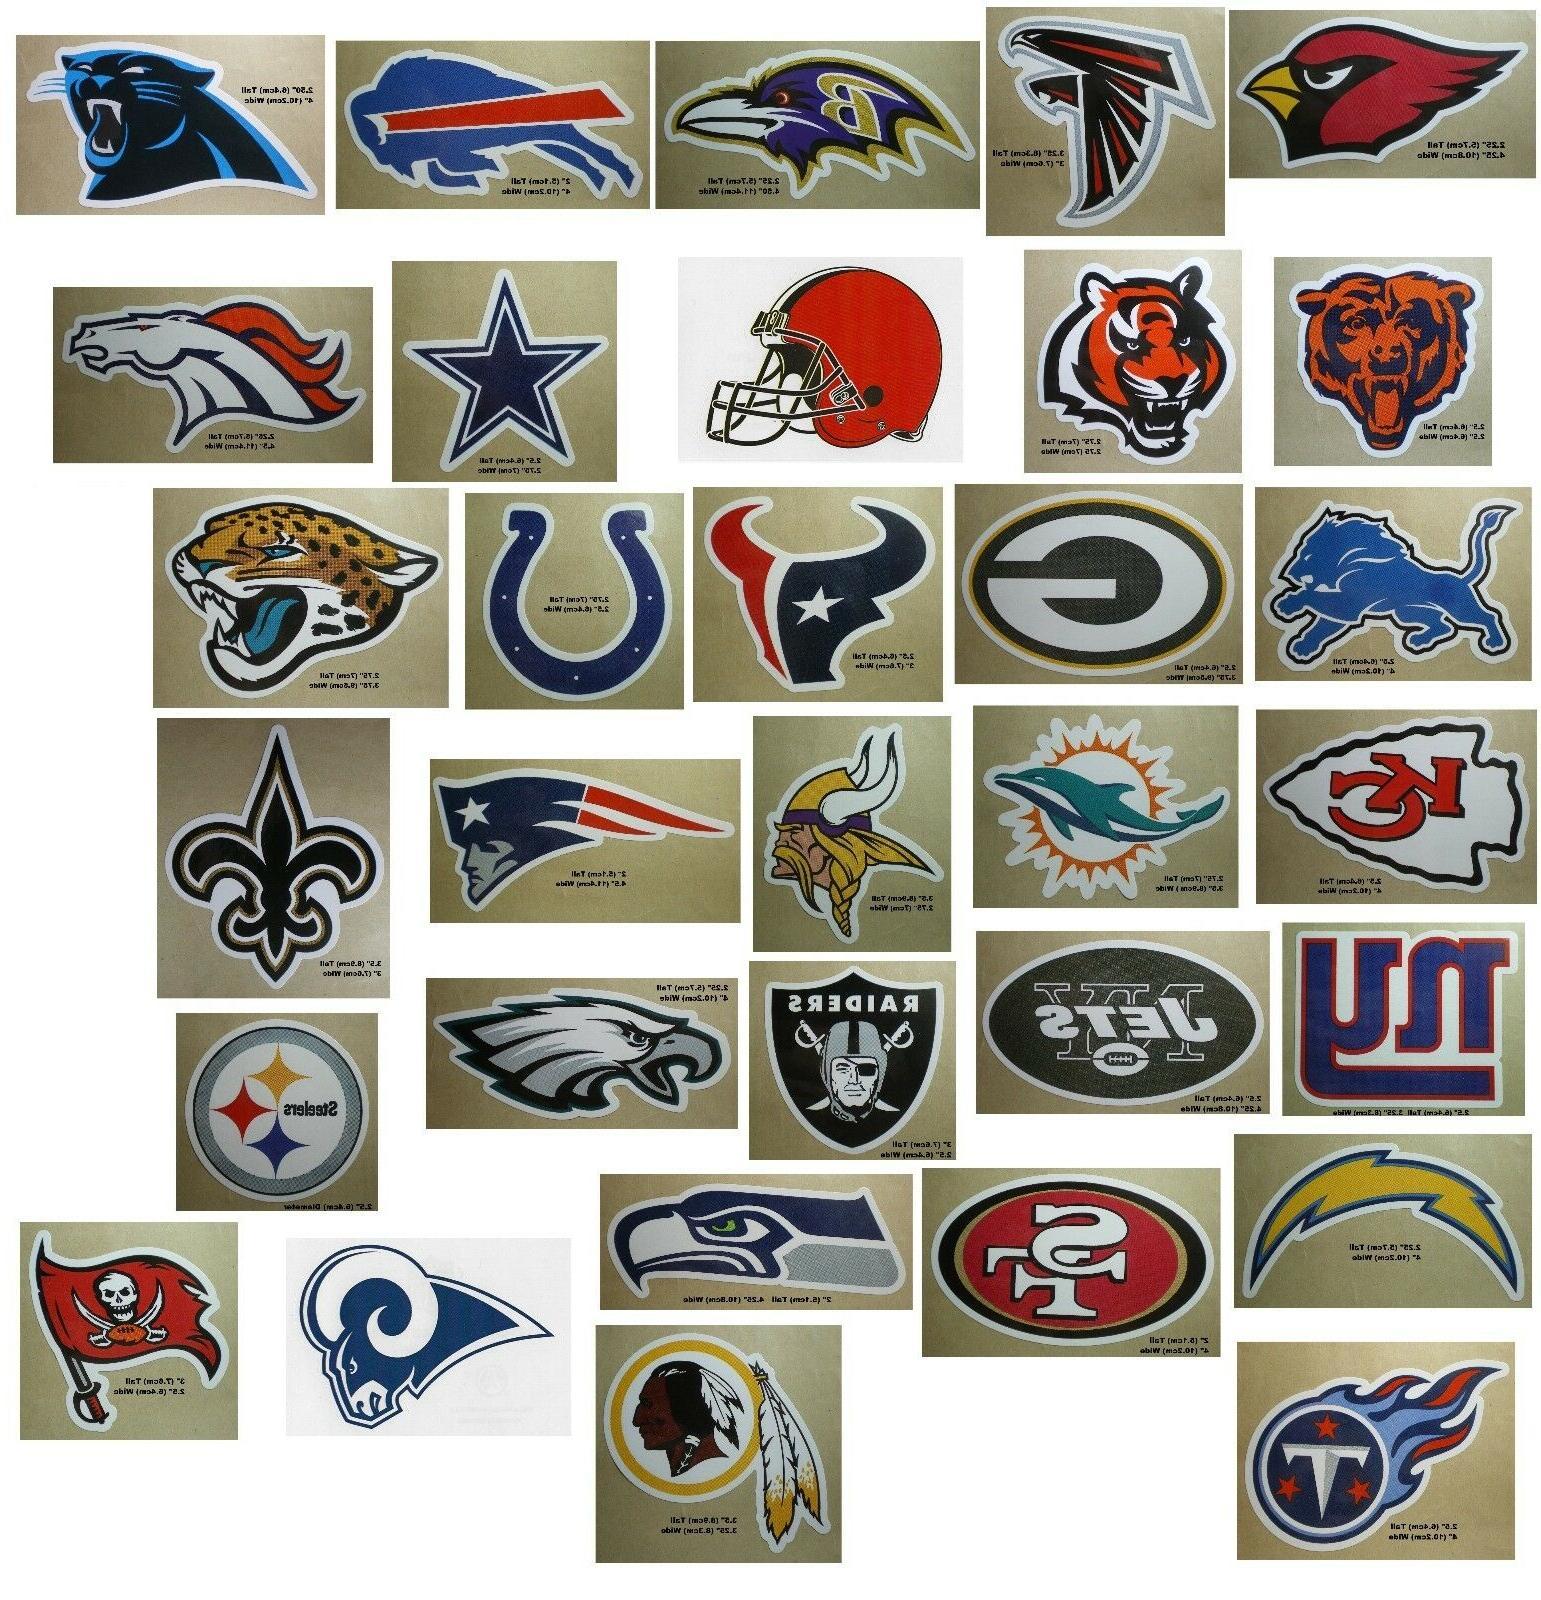 nfl football decal sticker team logo designs